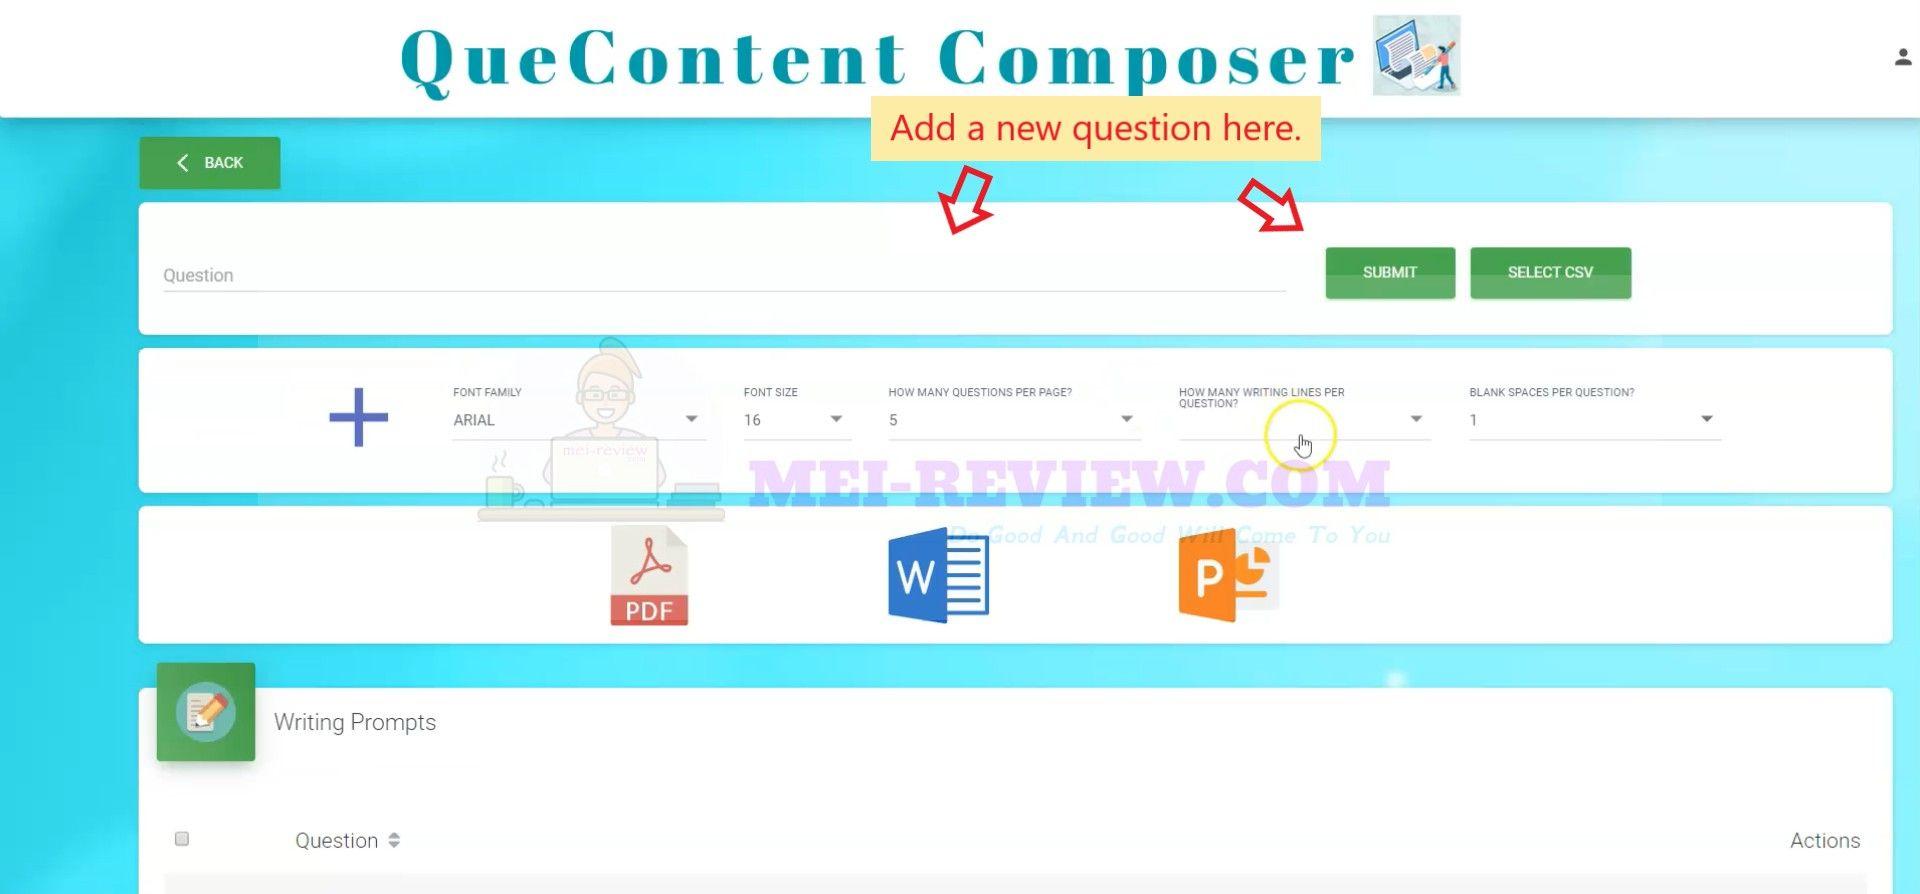 QueContent-Composer-how-to-use-3